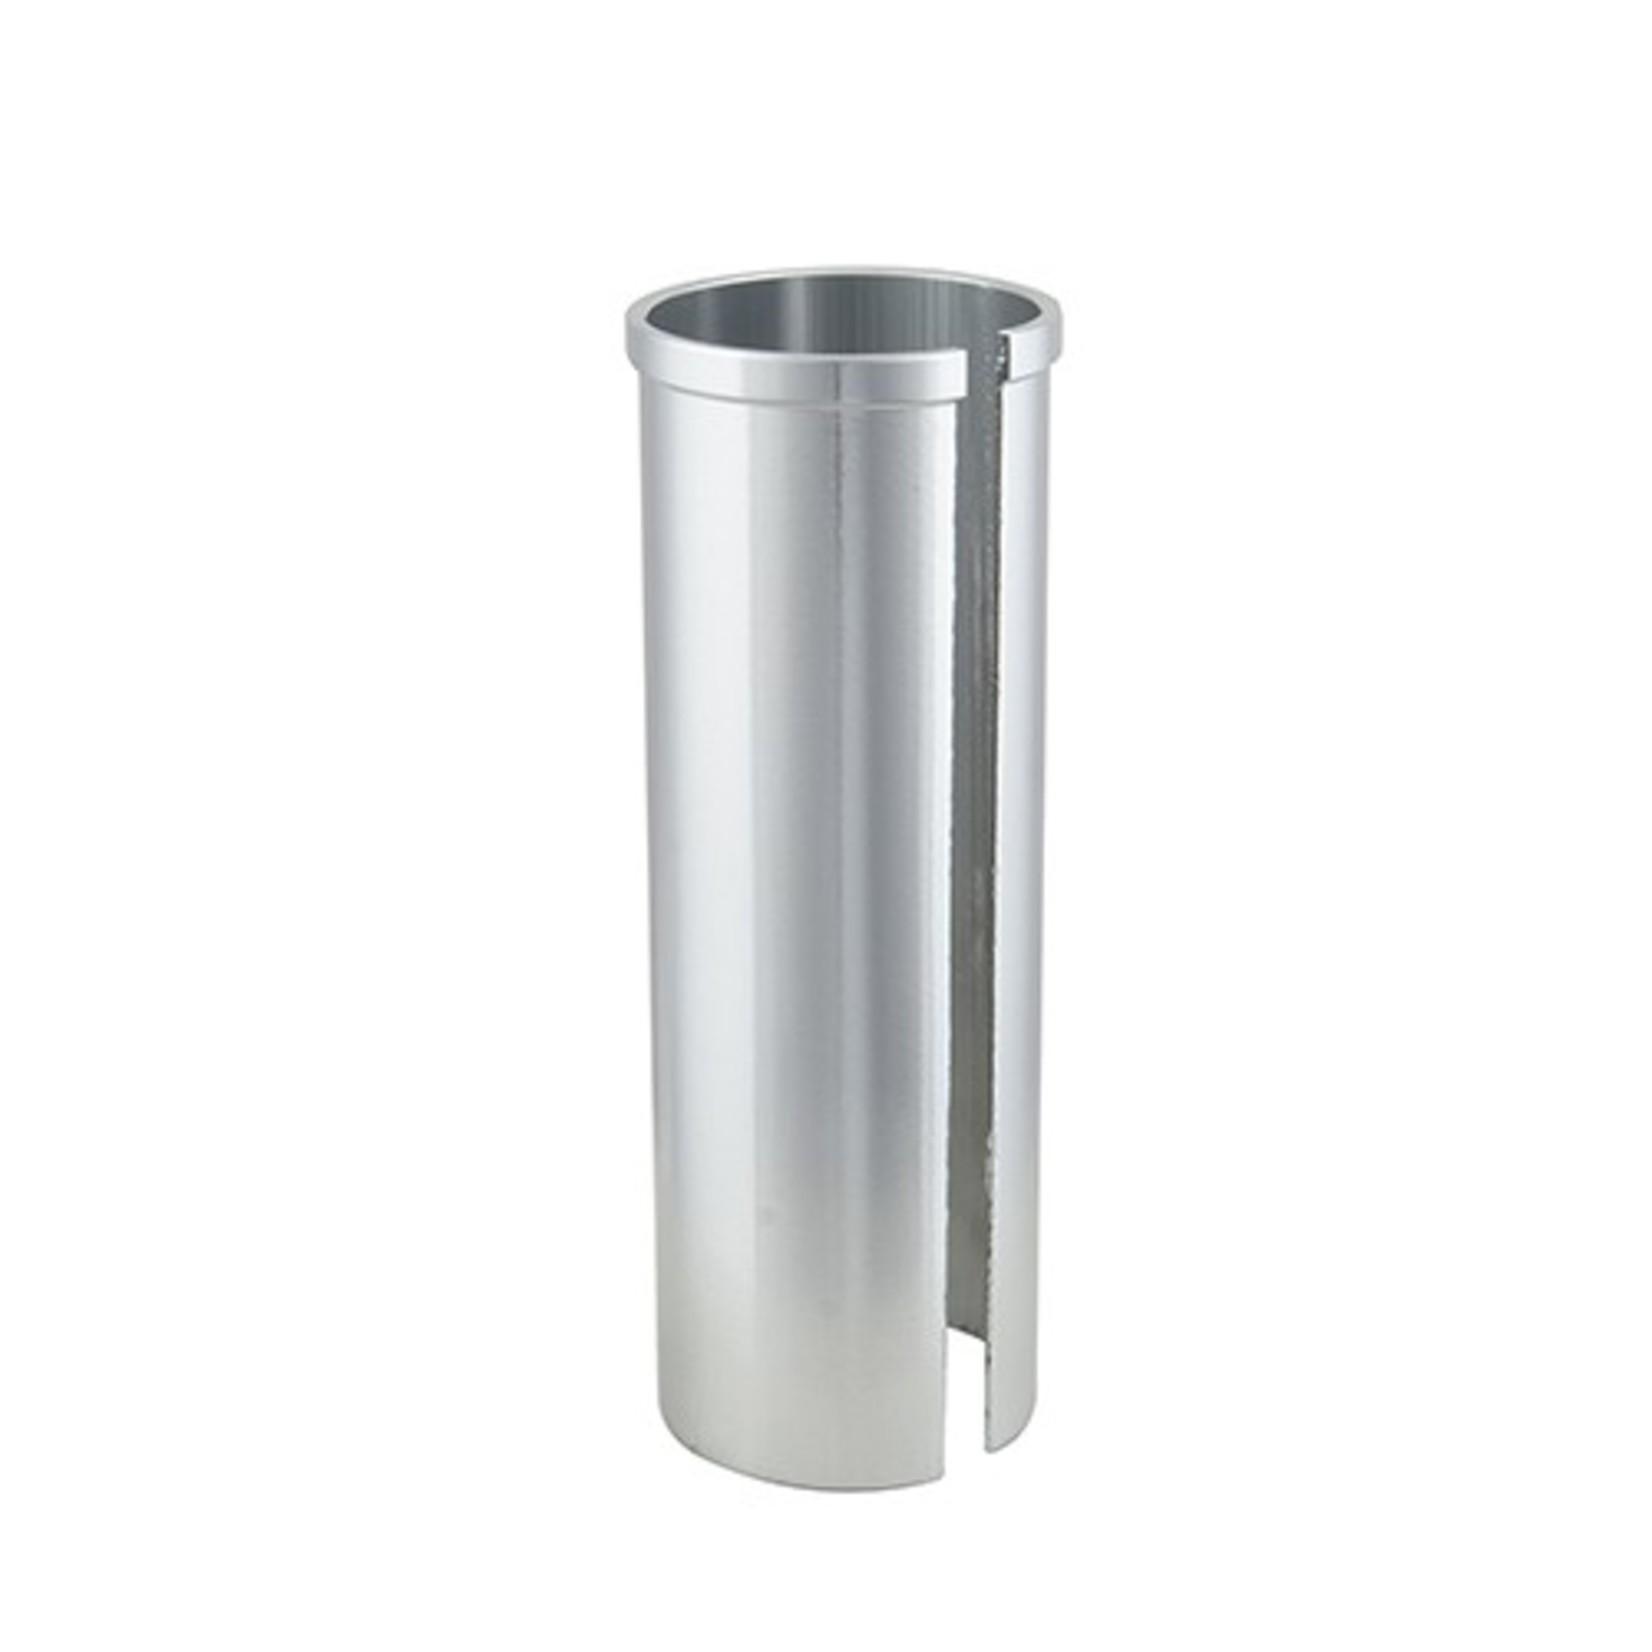 Sunlite Sunlt Aly Seat Post Shim 25.4mm